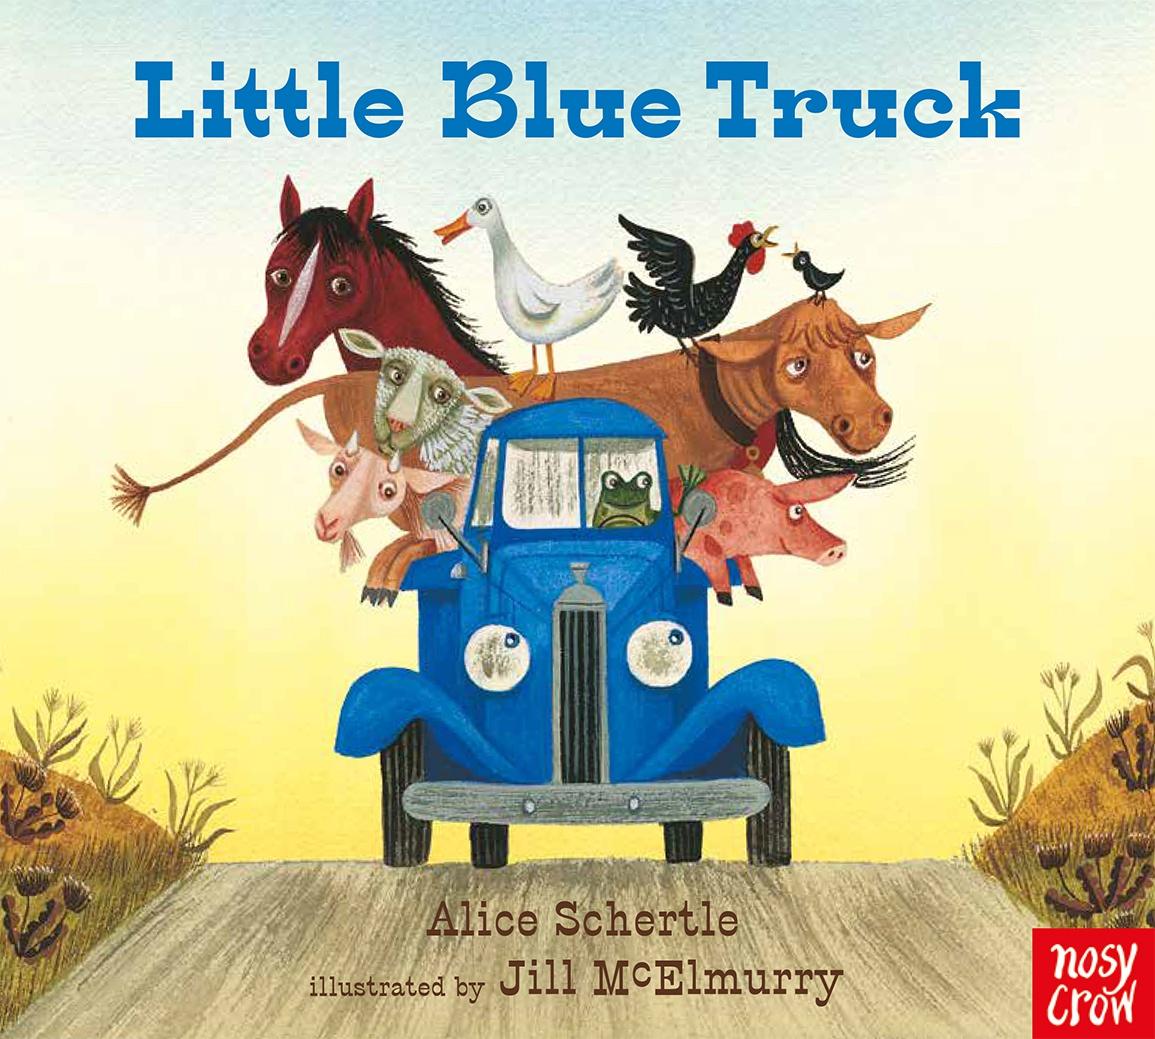 Alice Schertle, Illustrated By Jill